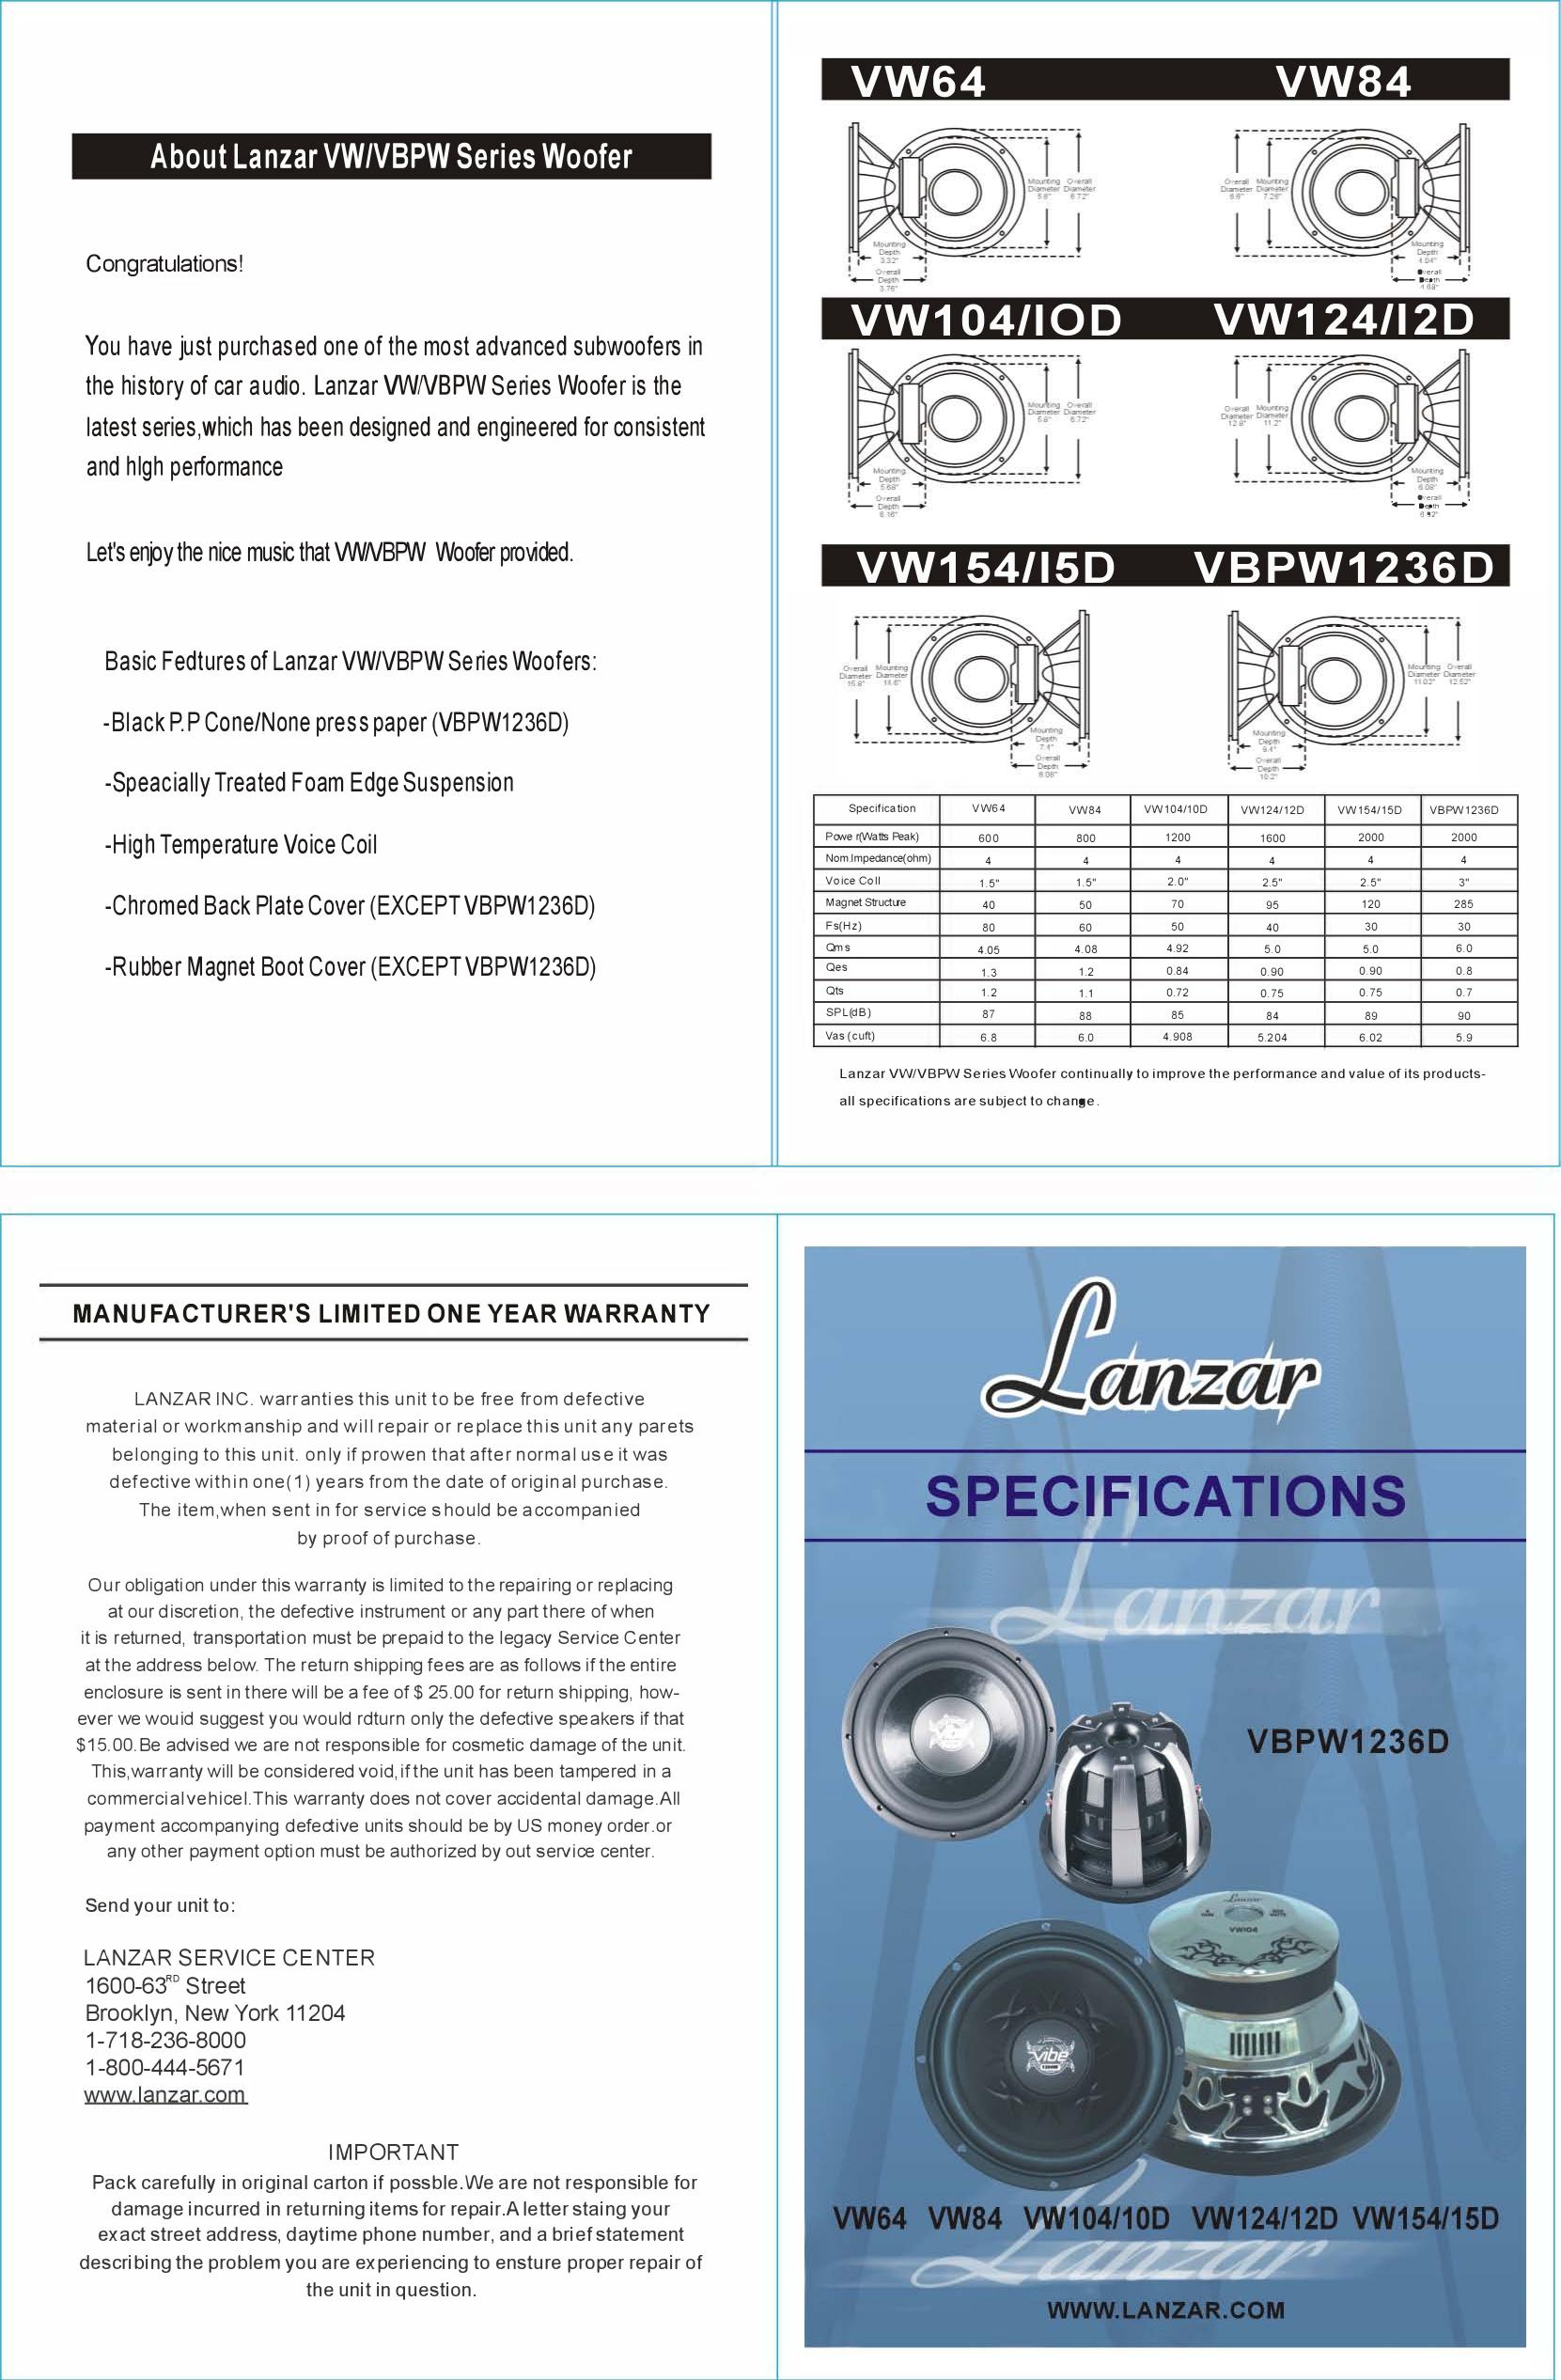 pdf for Lanzar Subwoofer Vibe VW104 manual